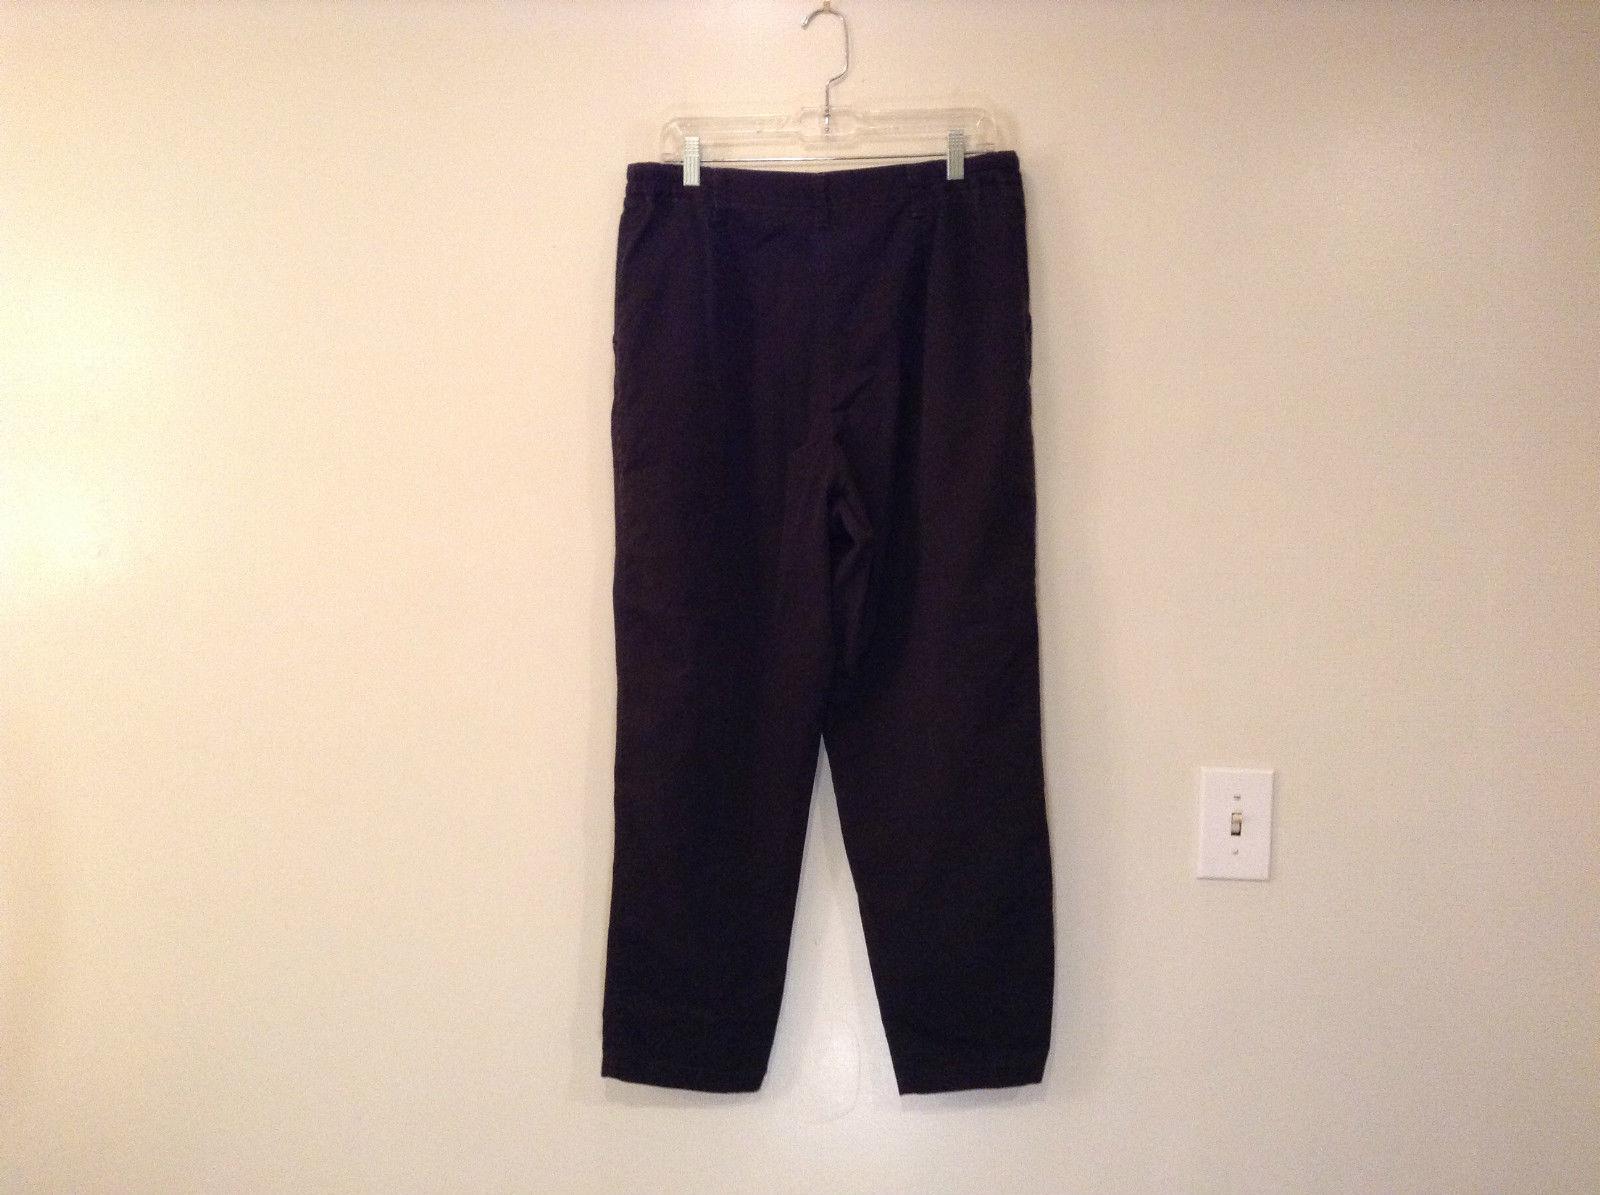 Size 16 Petite Black Lee Casual Pants Front Pleats Elastic Inserts on Waist